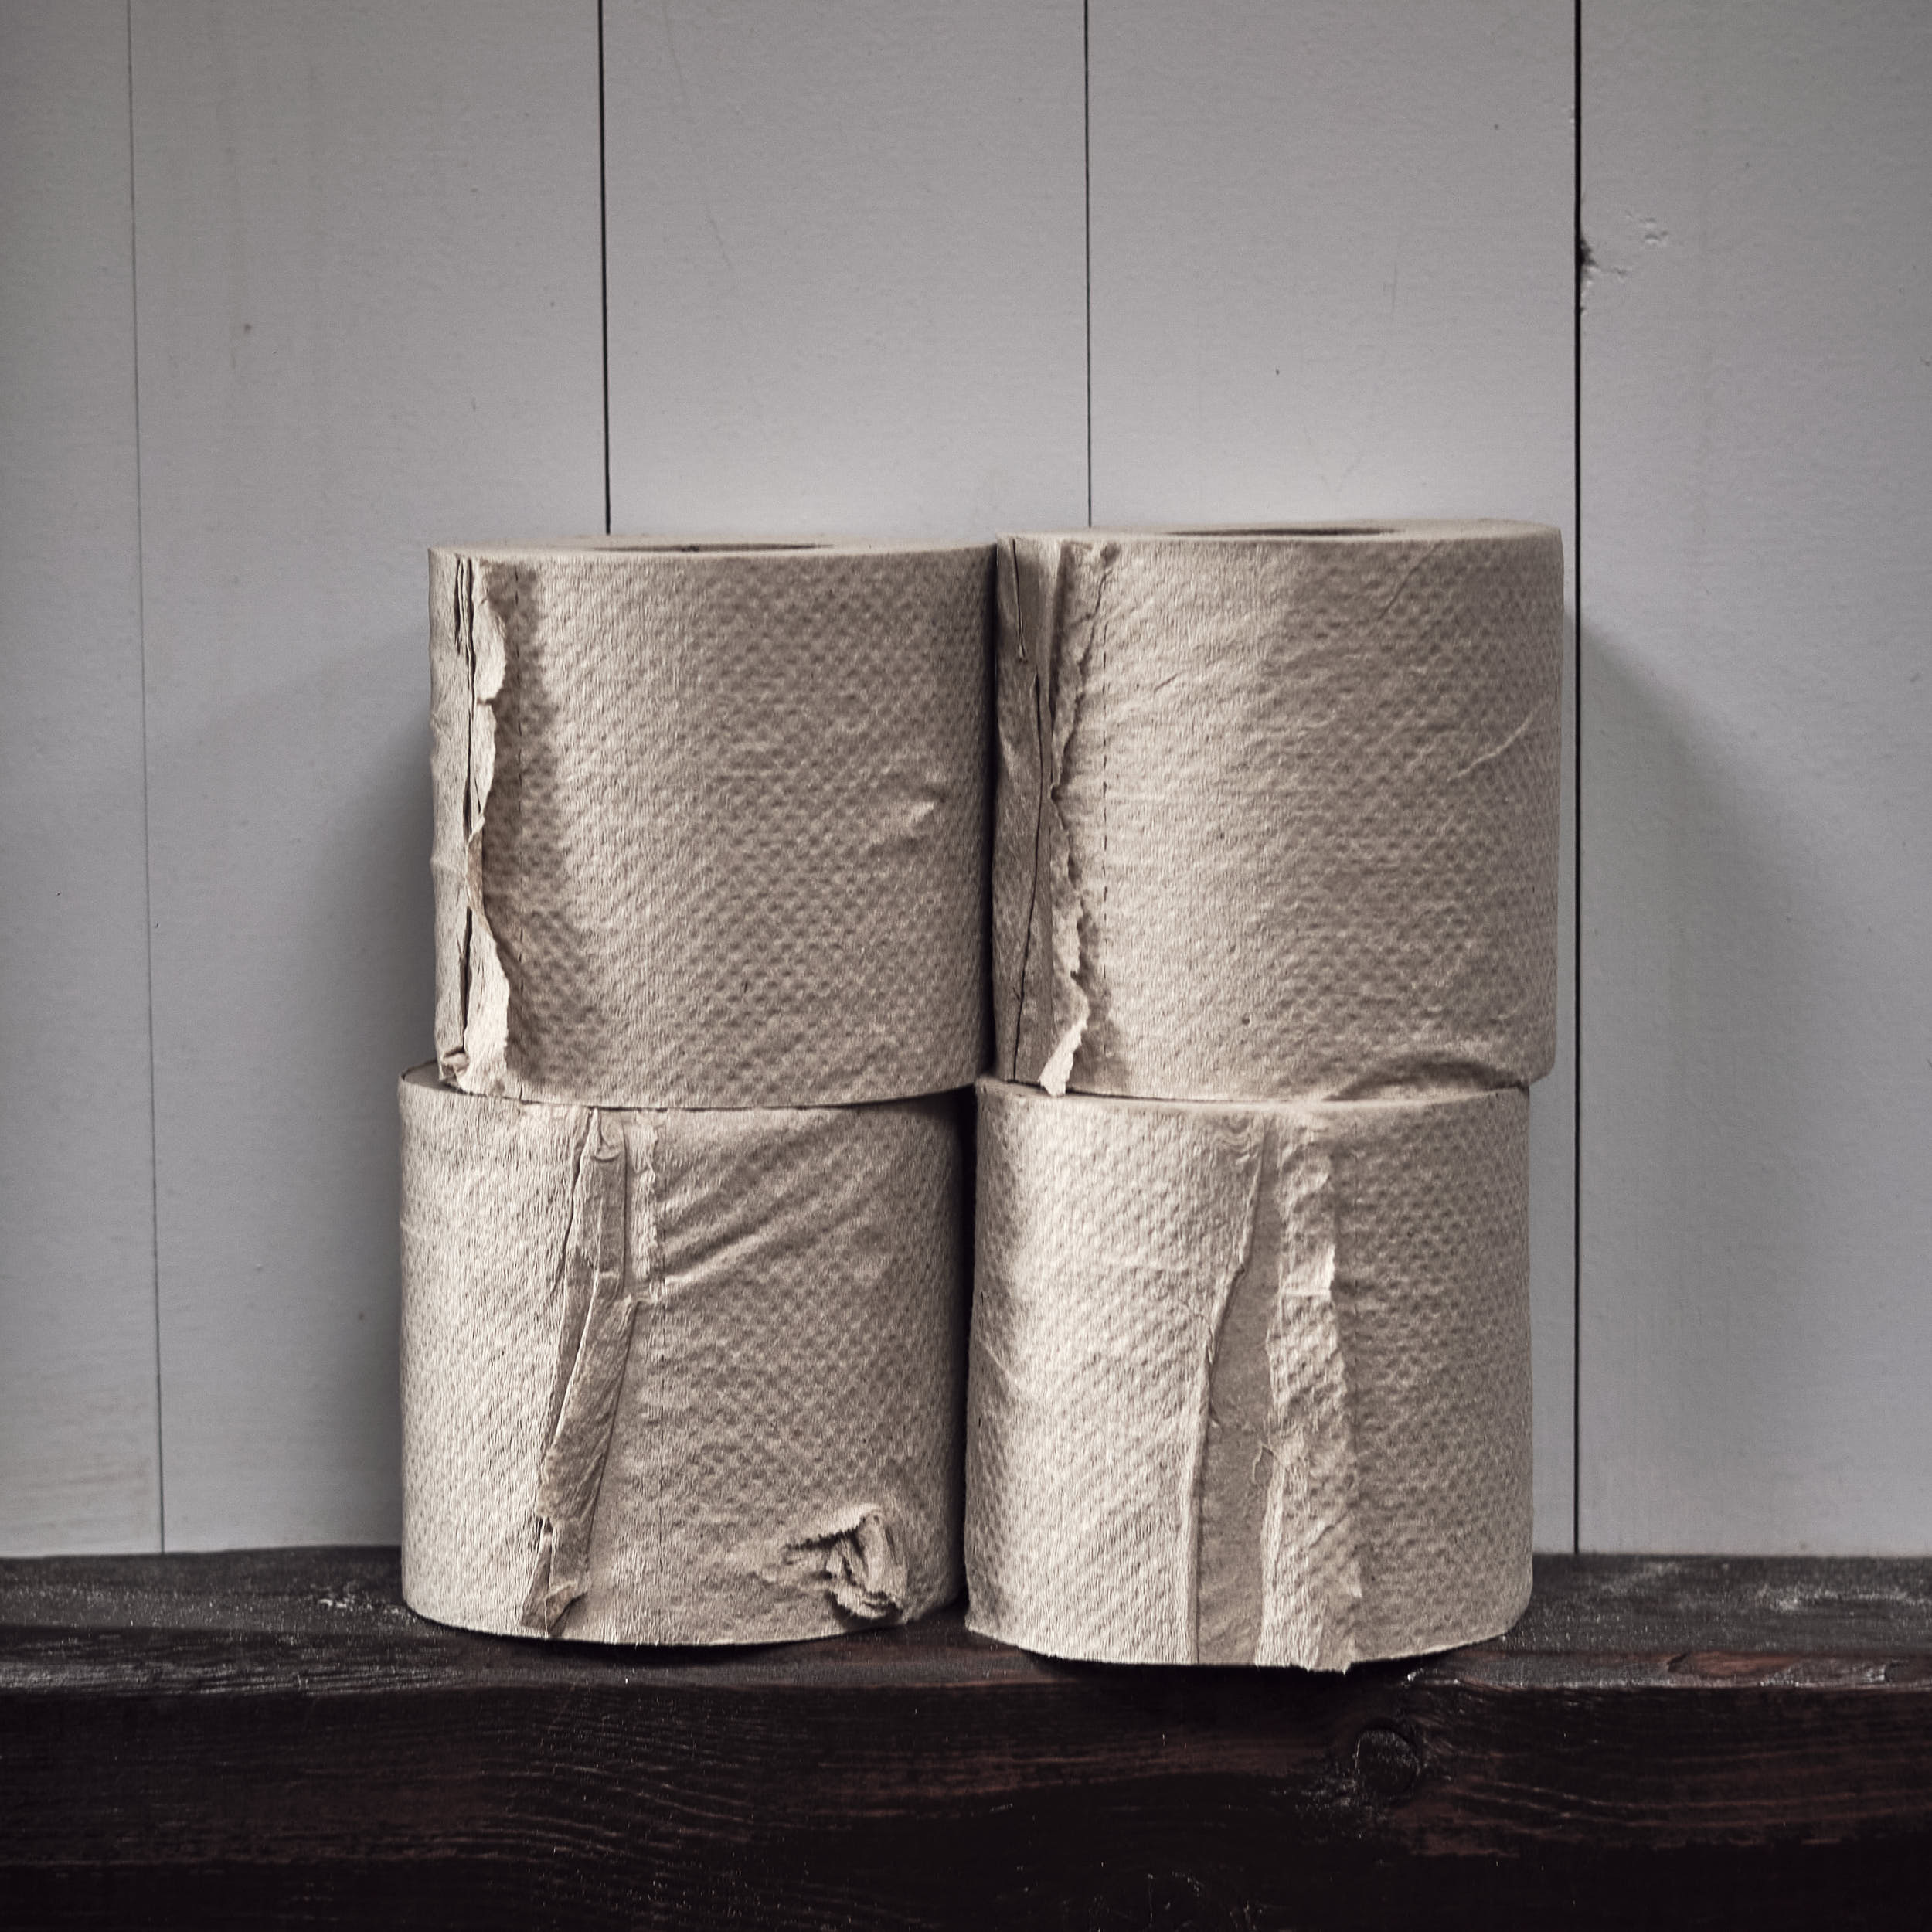 Öko-Toilettenpapier Sankt-Peter-Ording